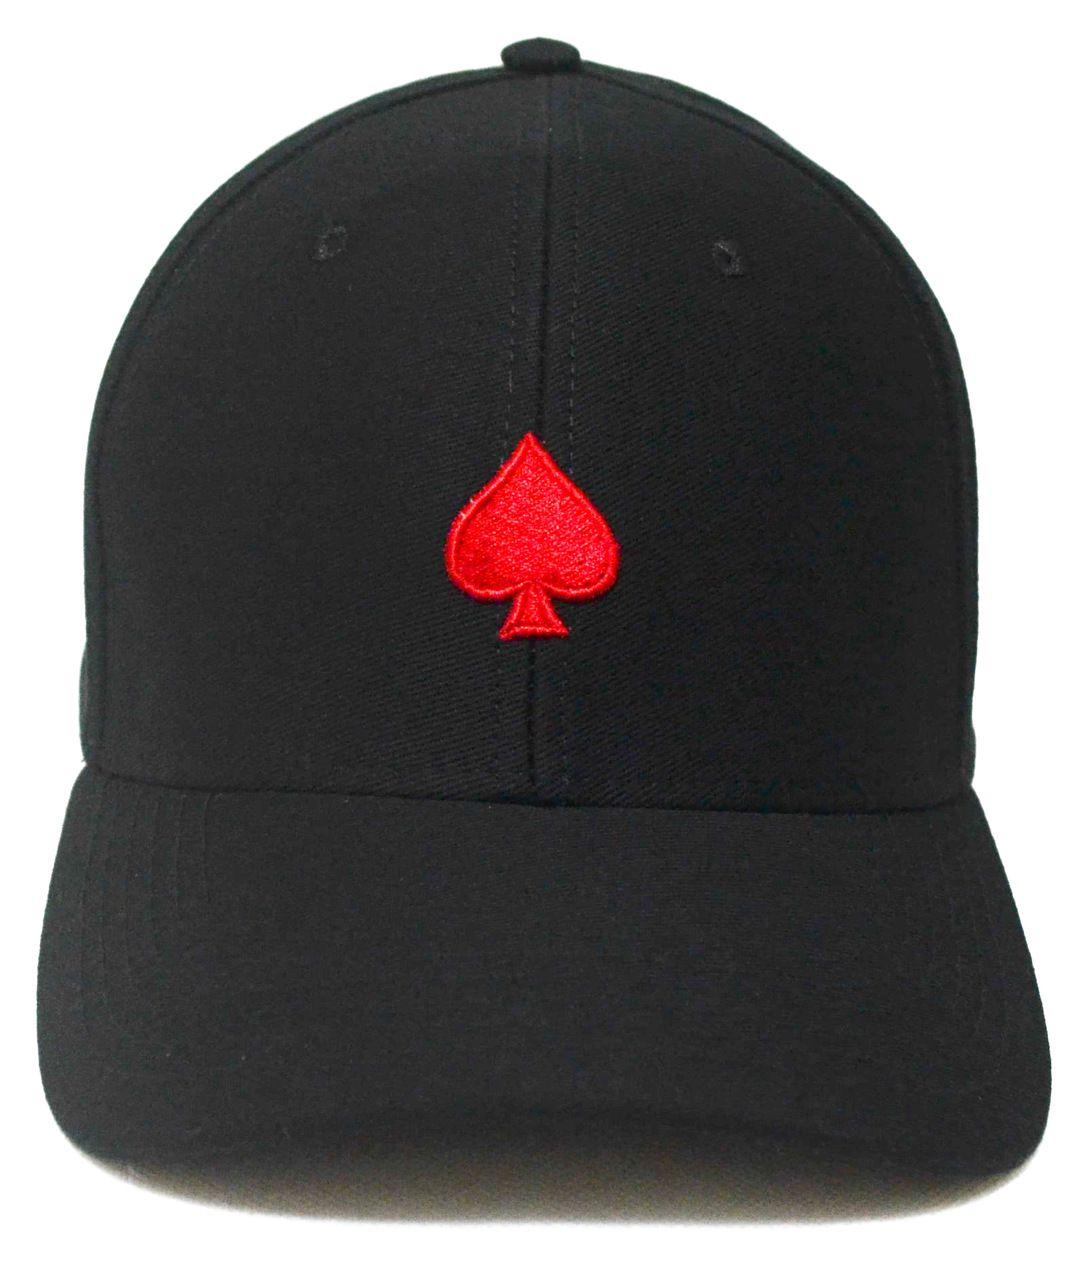 Boné Poker Preto Naipes Espadas Aba Curva De Fita Strapback c15a0f8c6a158